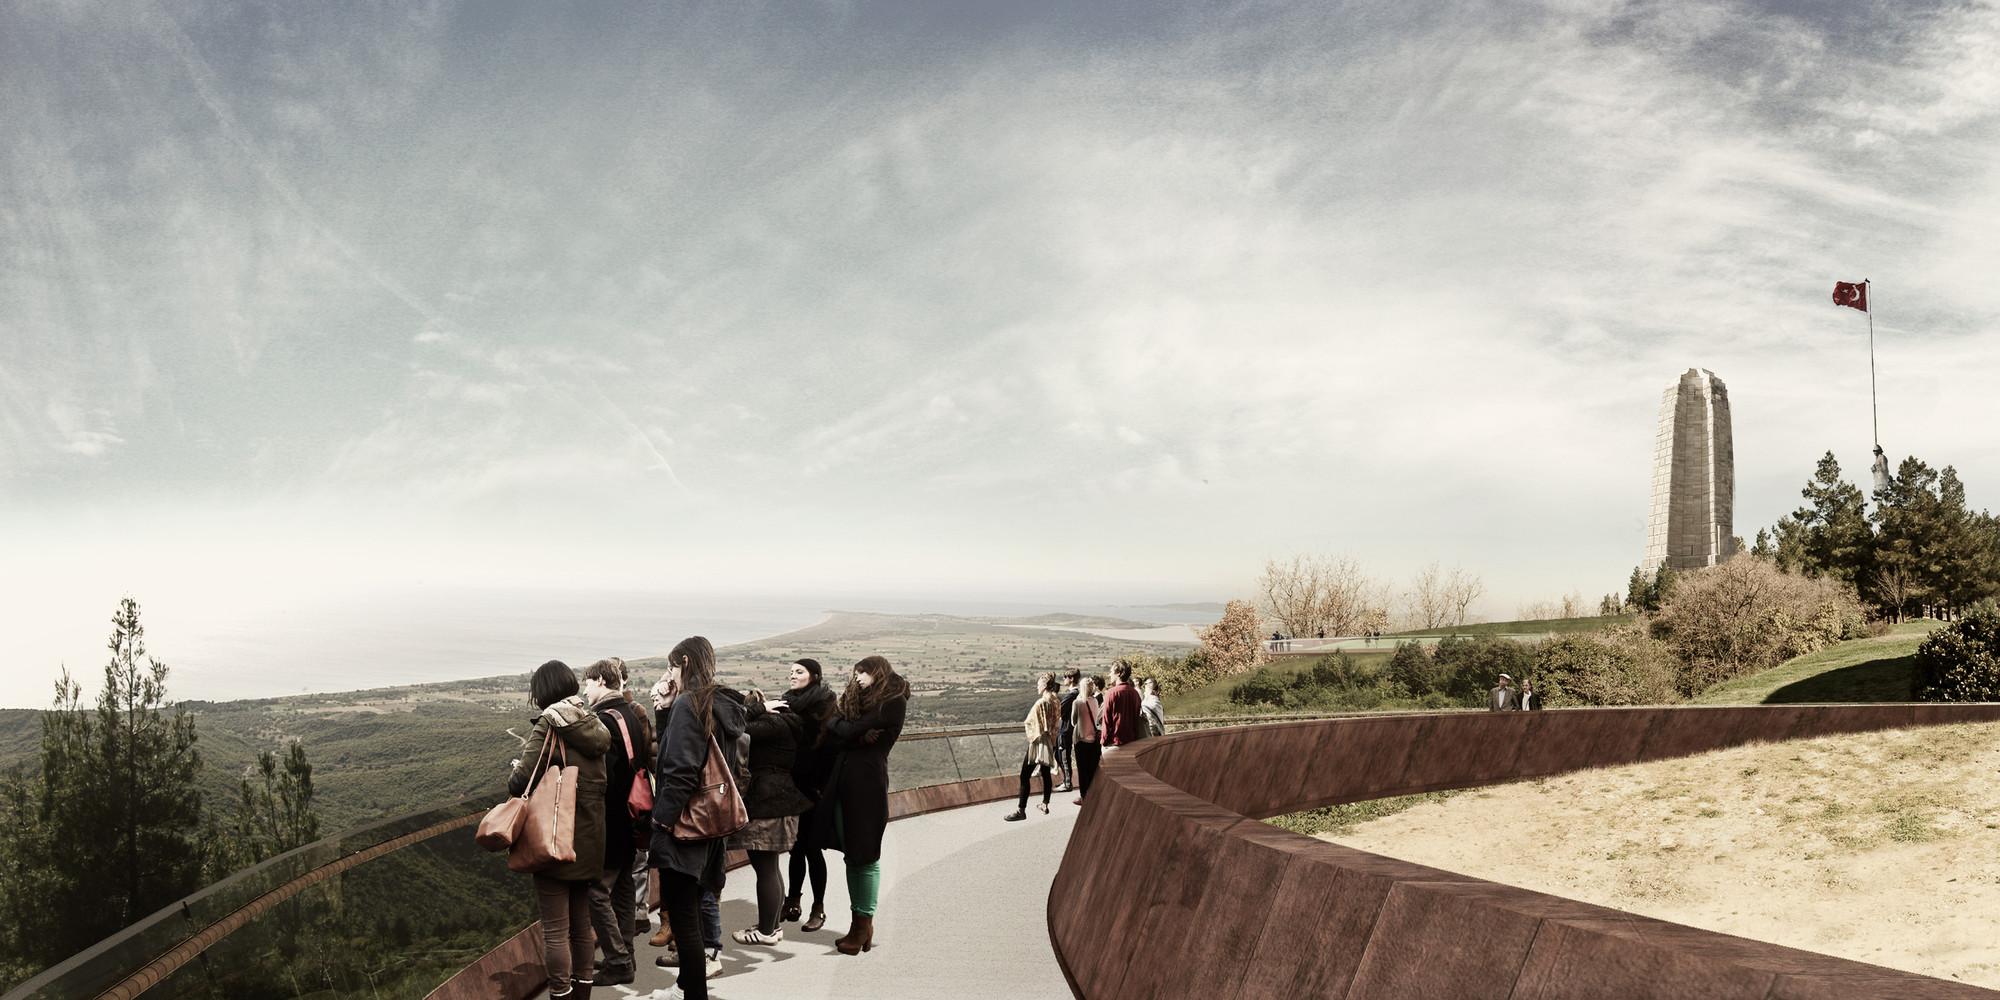 Özer/Ürger Architects + ON Design Take Third Place in Gallipoli National Park Competition, Courtesy of Özer/Ürger Architects